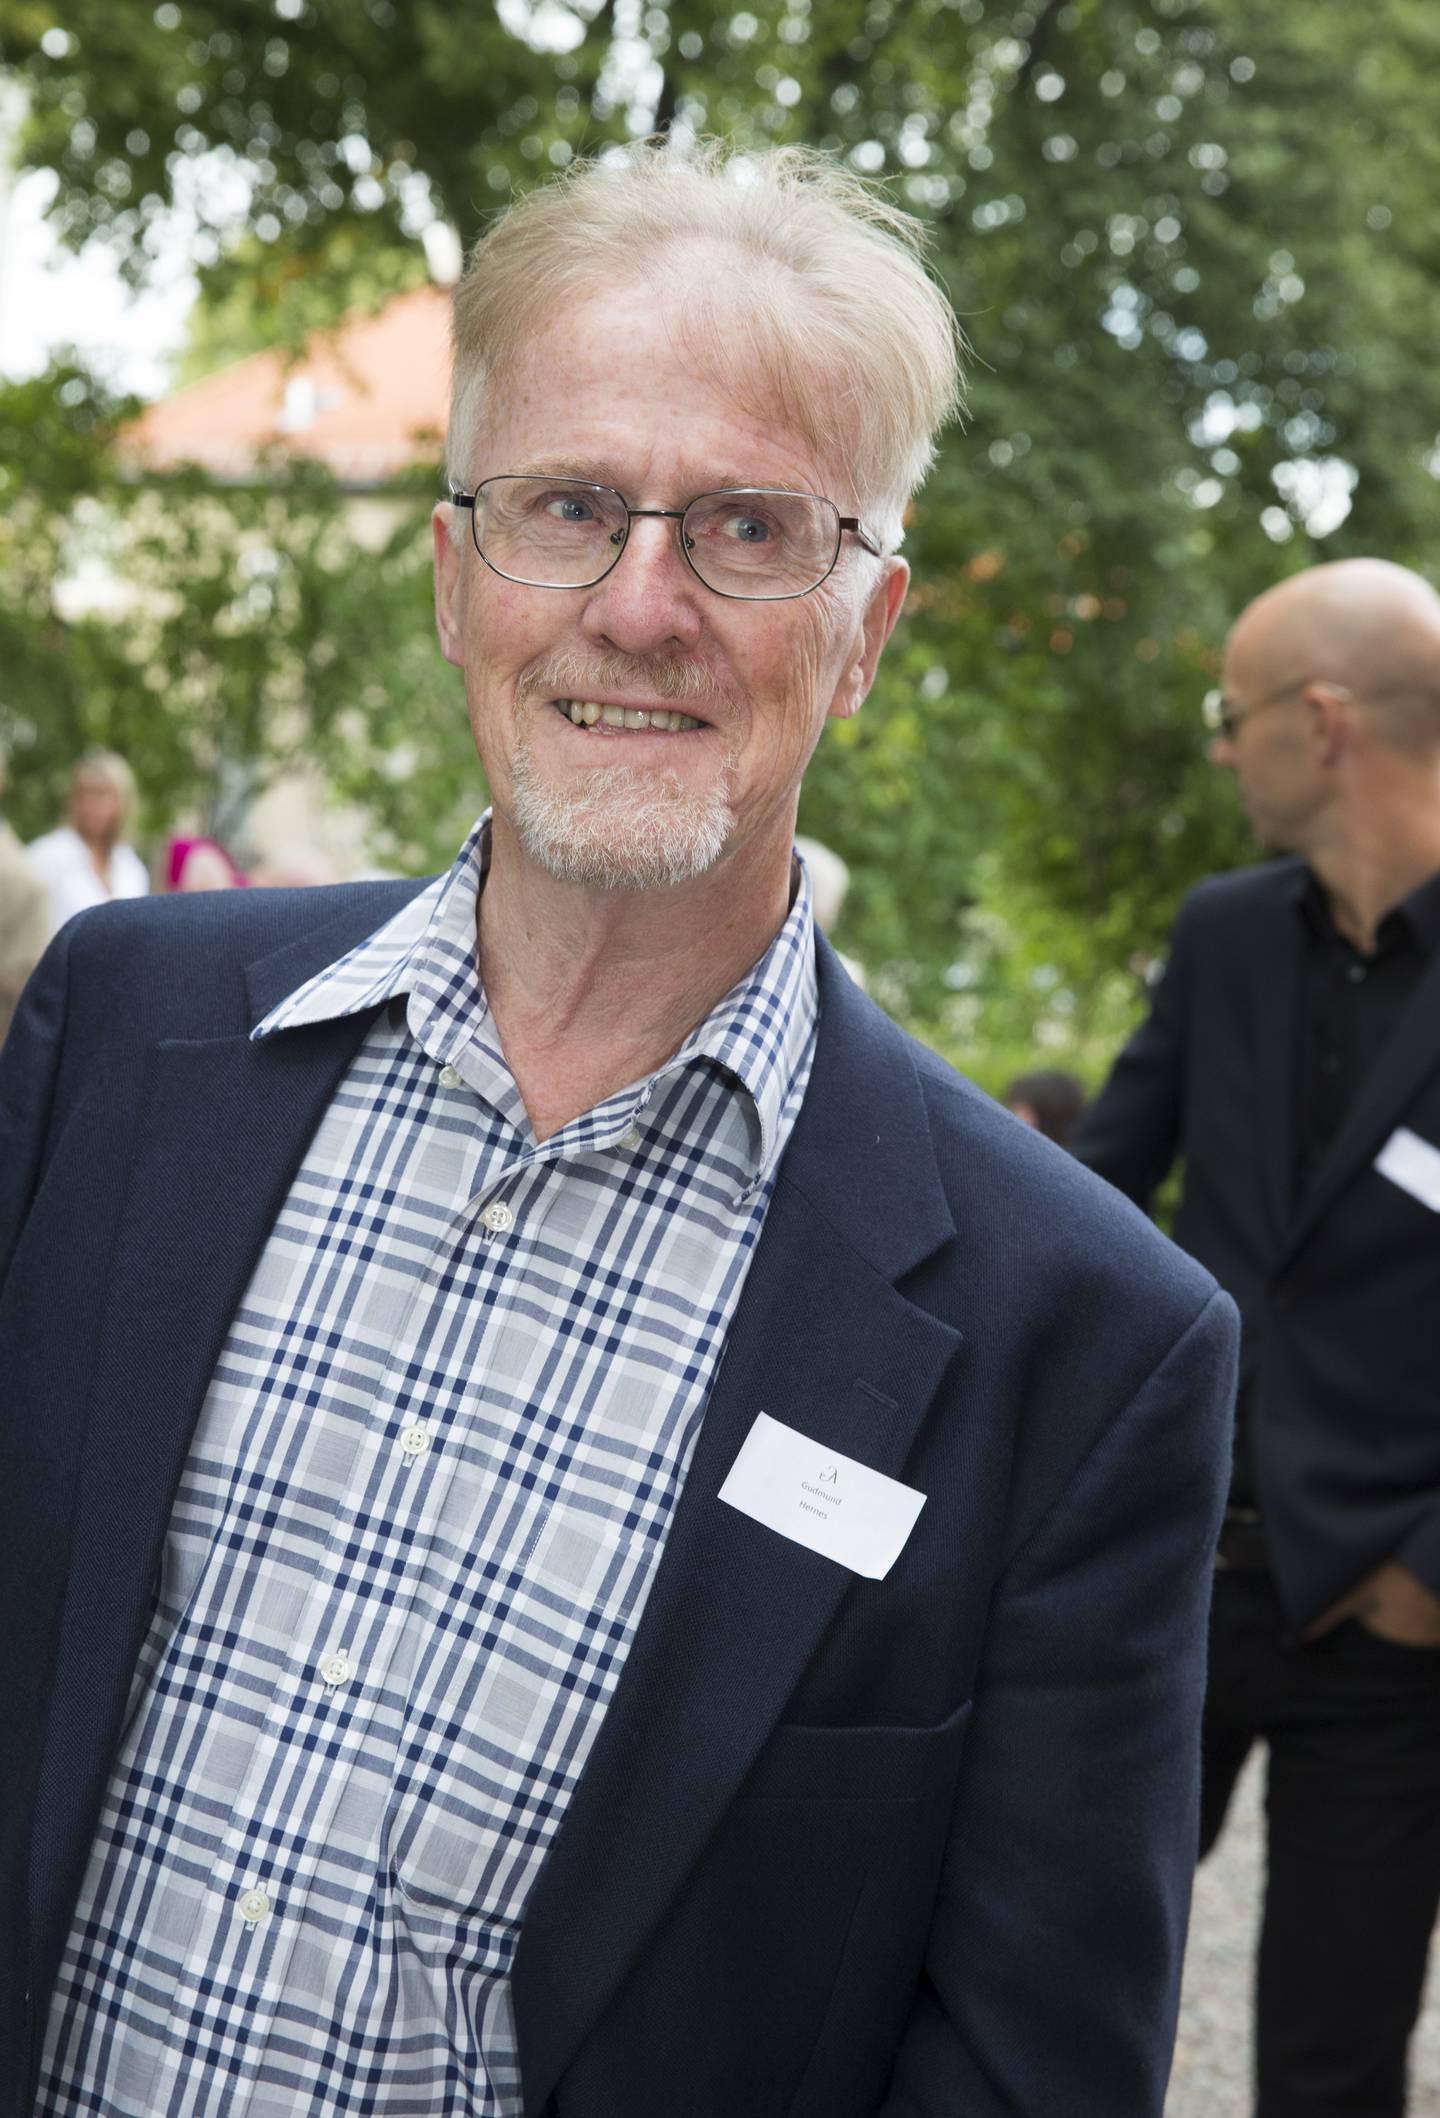 Oslo  20130829. Gudmund Hernes  på hagefesten til Aschehoug forlag torsdag ettermiddag. Foto: Berit Roald / NTB